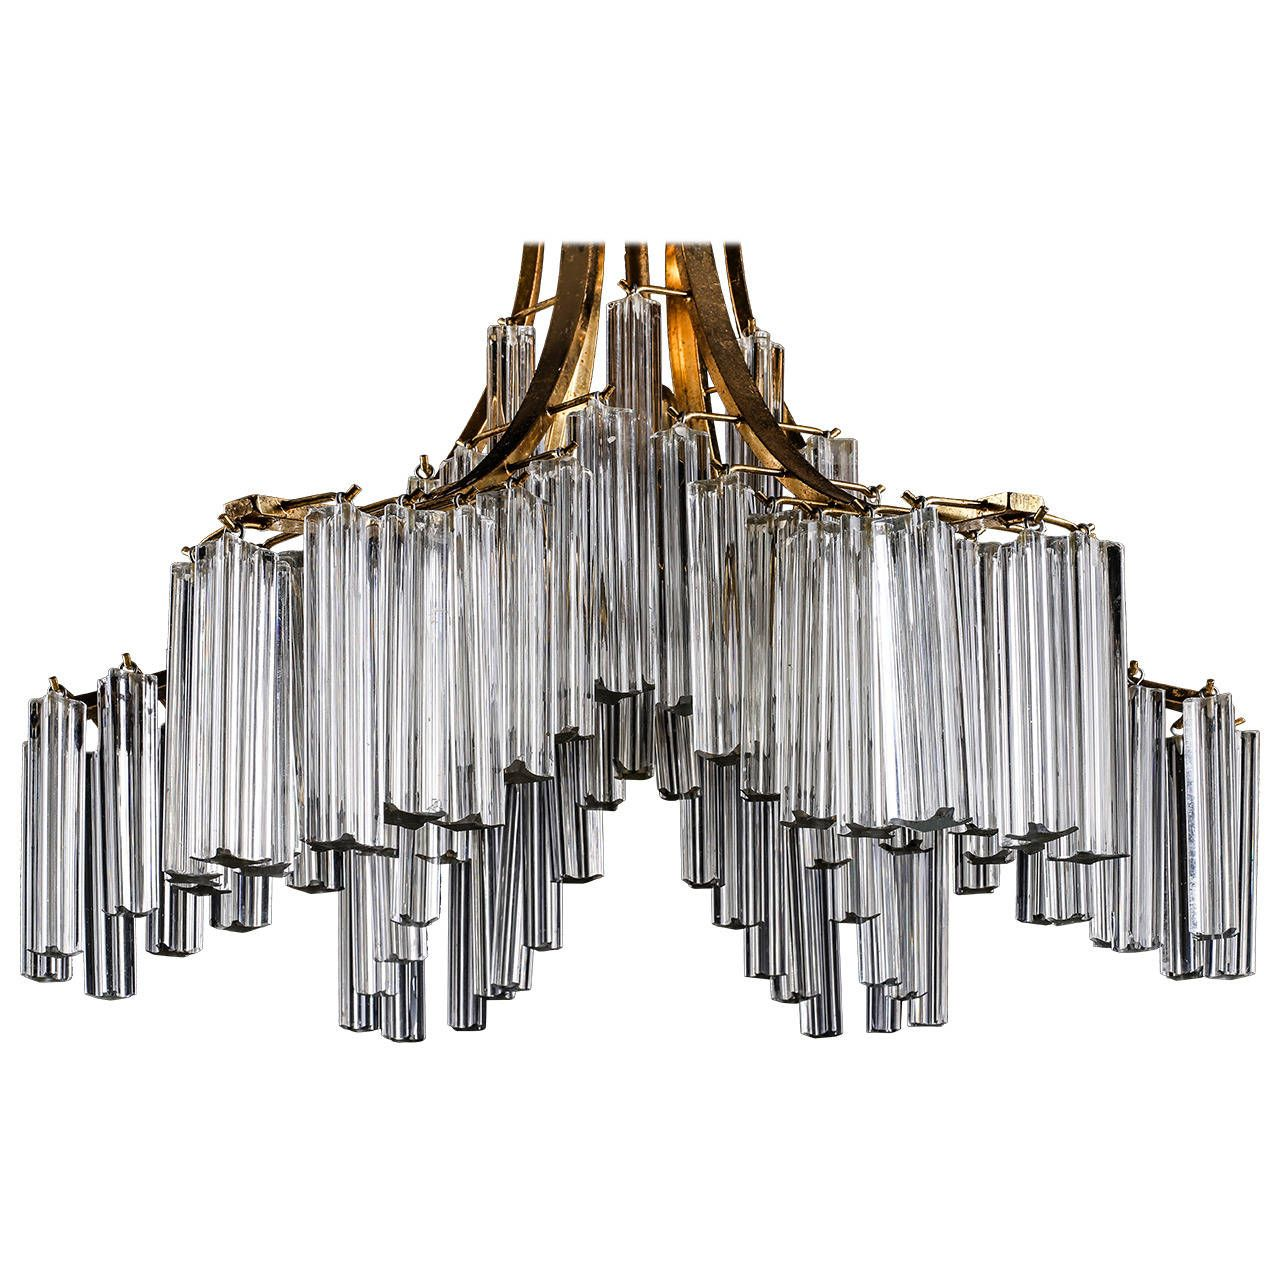 Italian murano clear glass sculptural chandelier by venini italian murano clear glass sculptural chandelier by venini arubaitofo Image collections